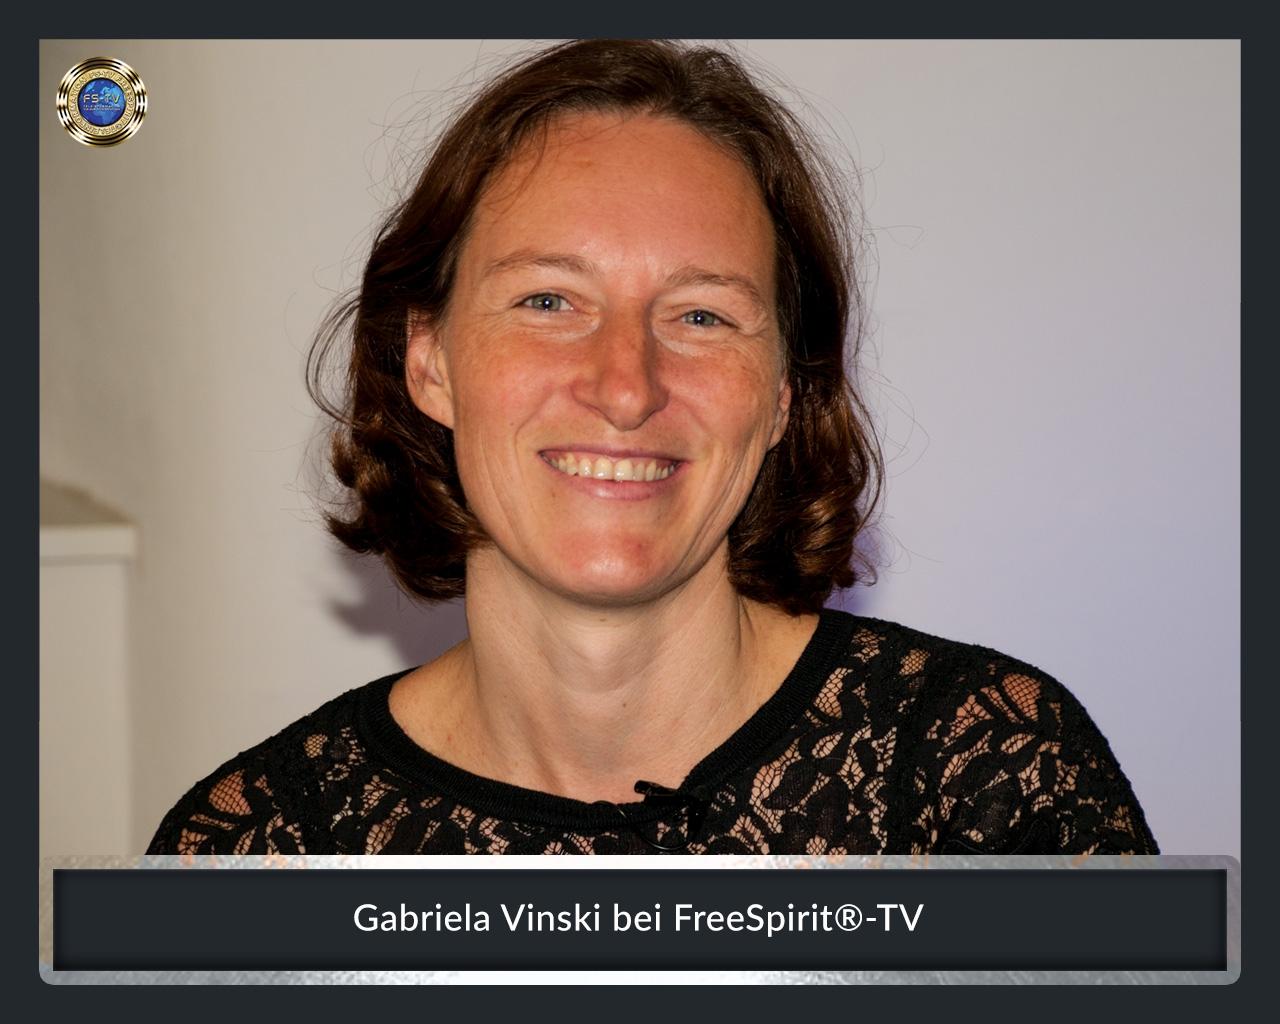 FS-TV-Bildergallerie-Gabriela-Vinski1